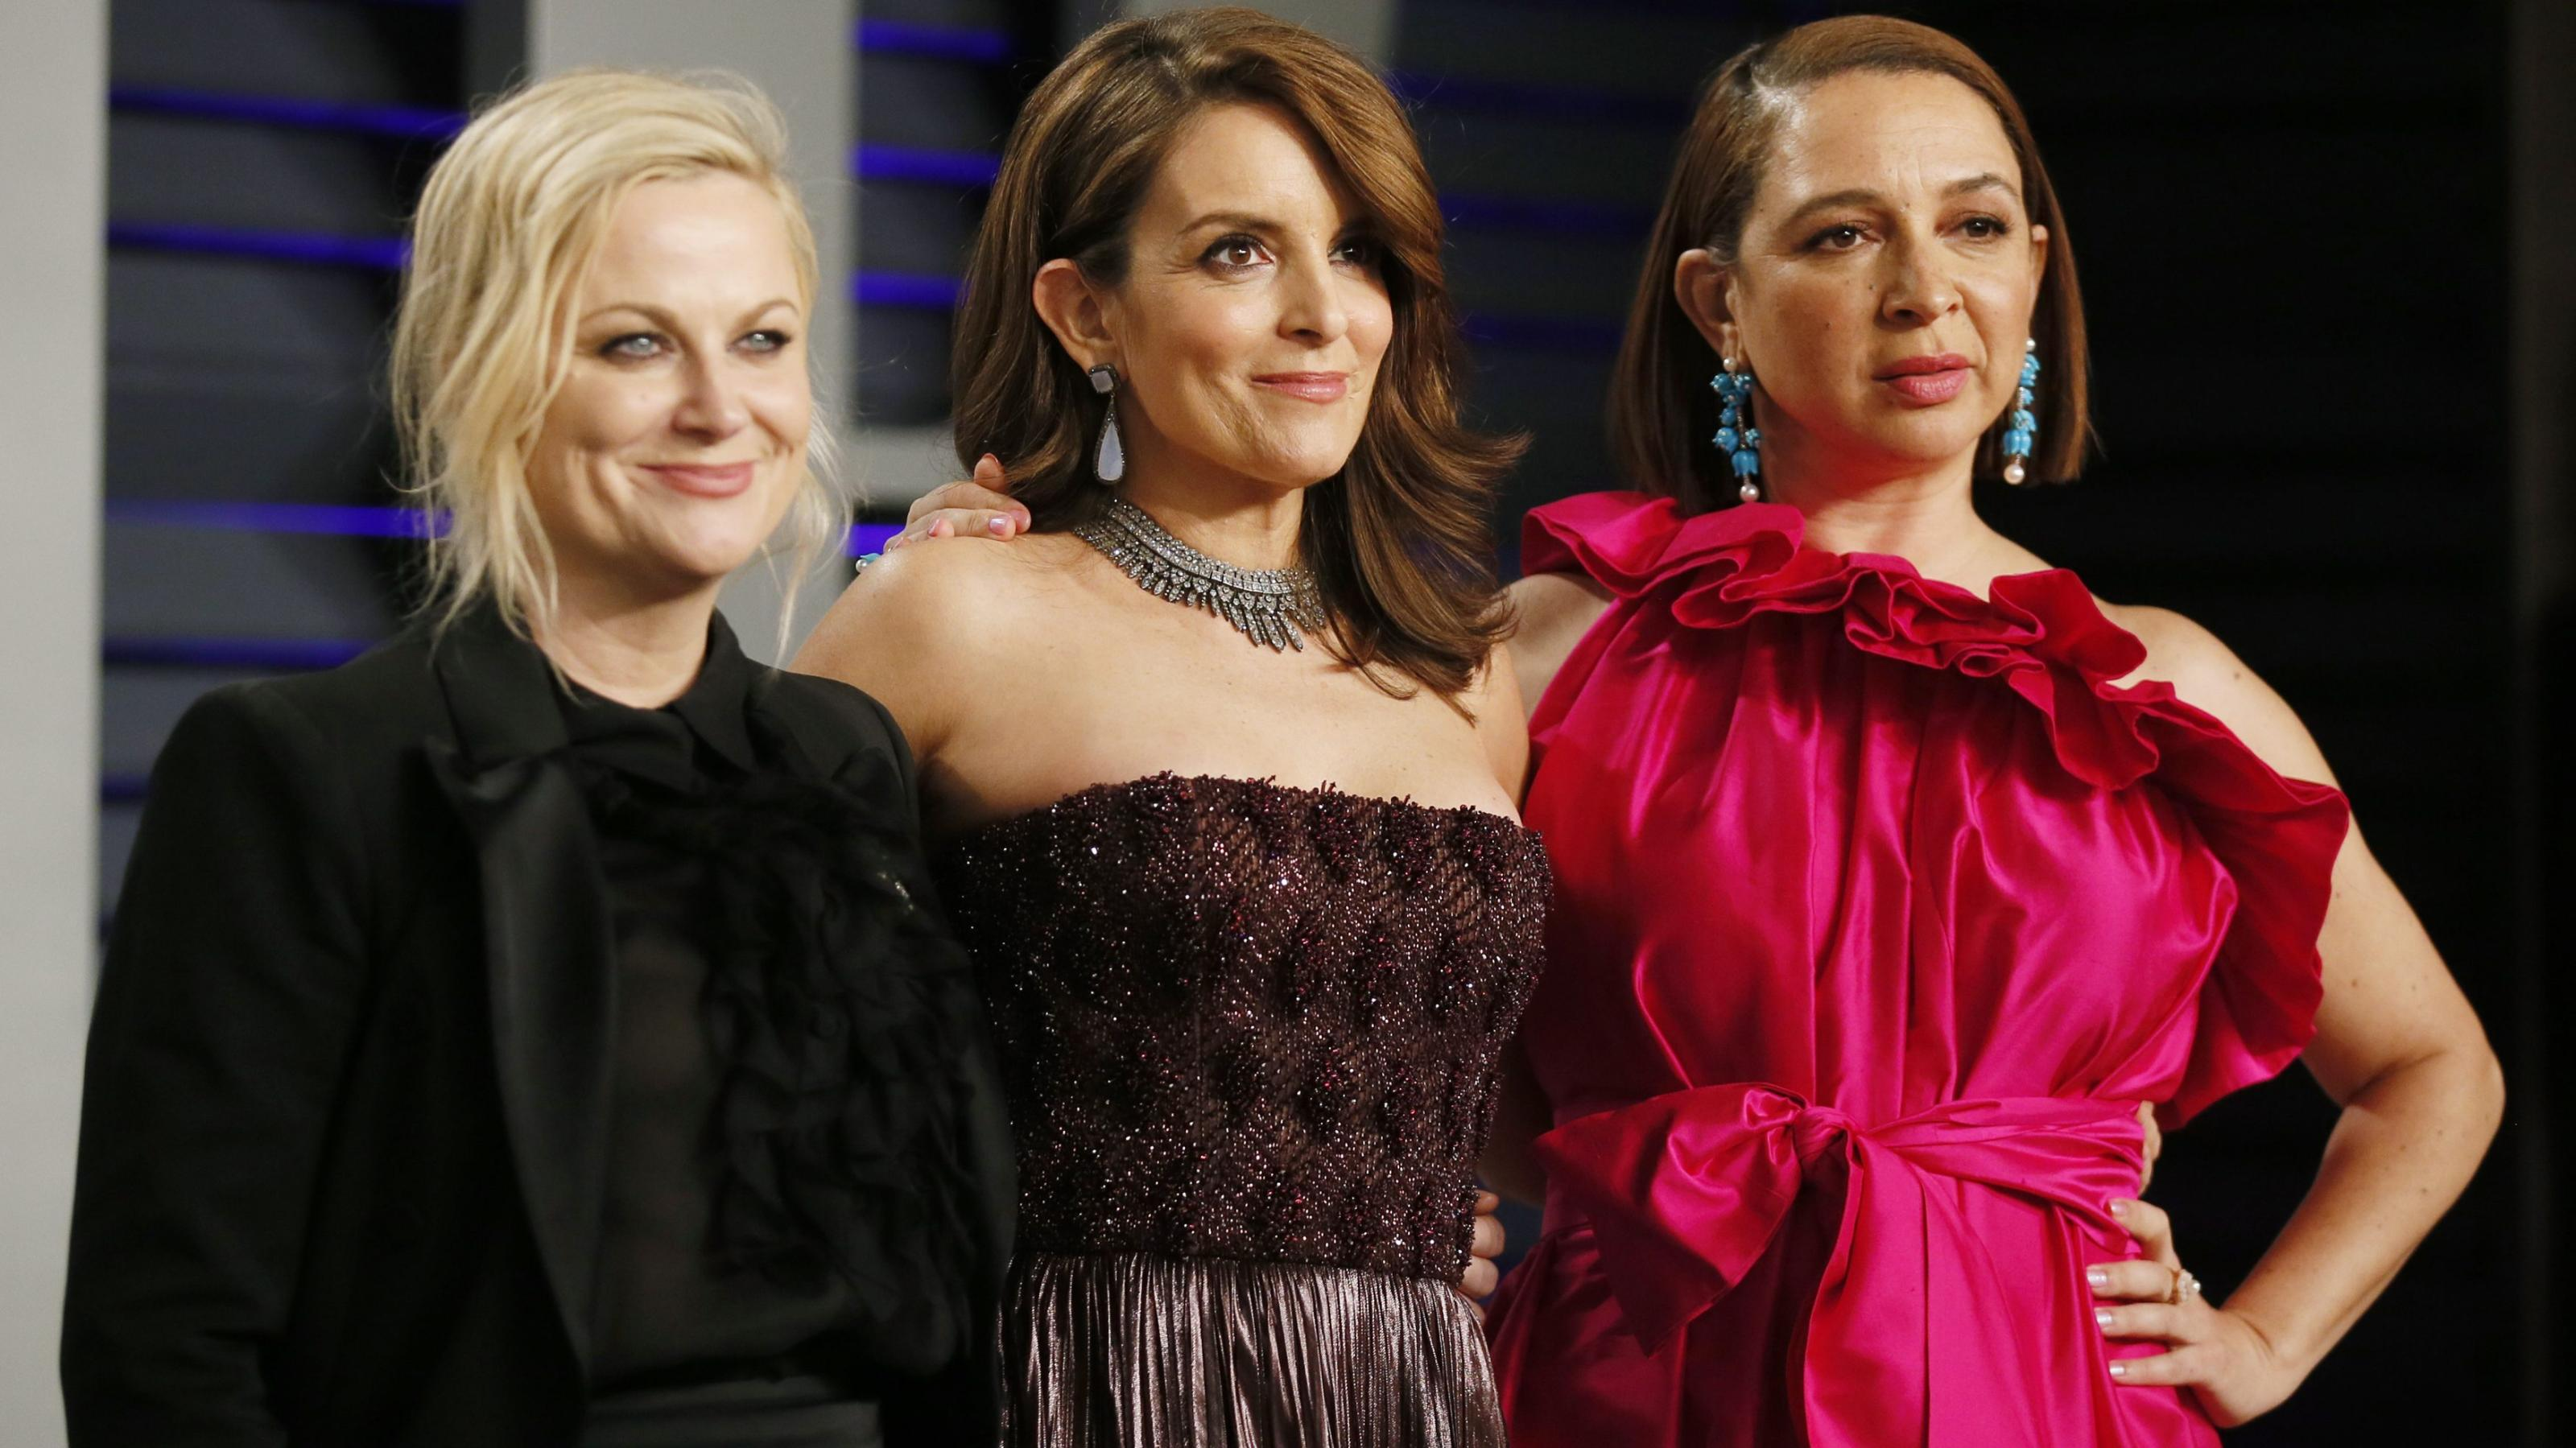 Melinda Gates wants comedians to make fun of gender inequality